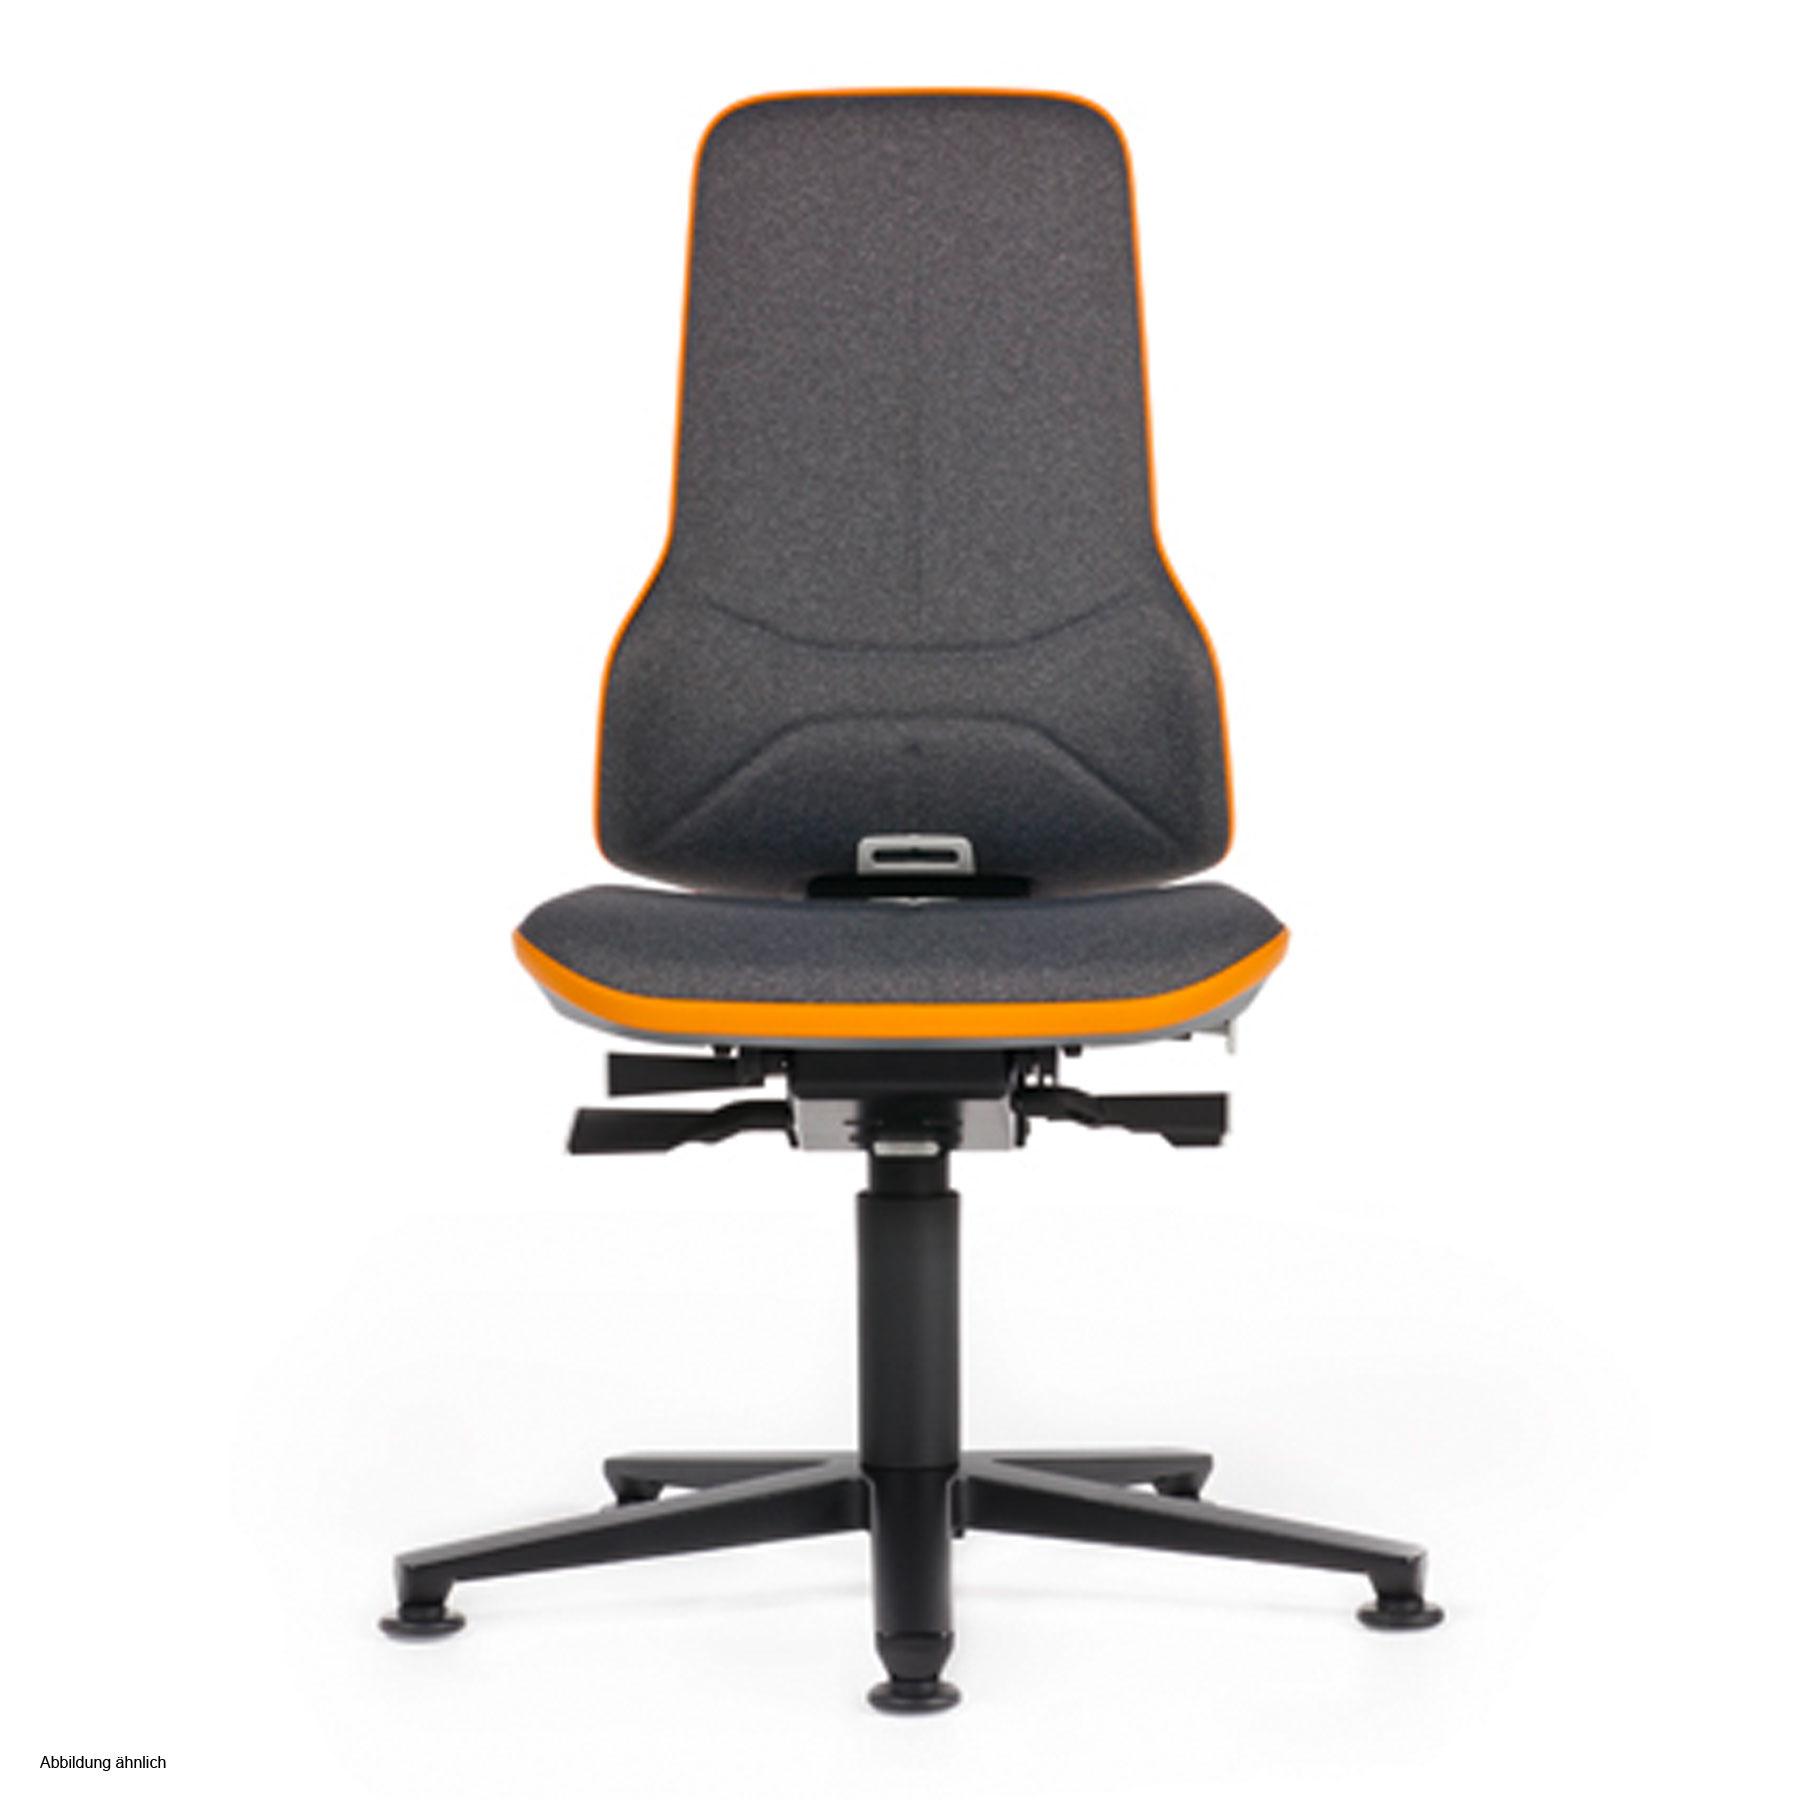 bimos Arbeitsdrehstuhl Neon, 369,60€